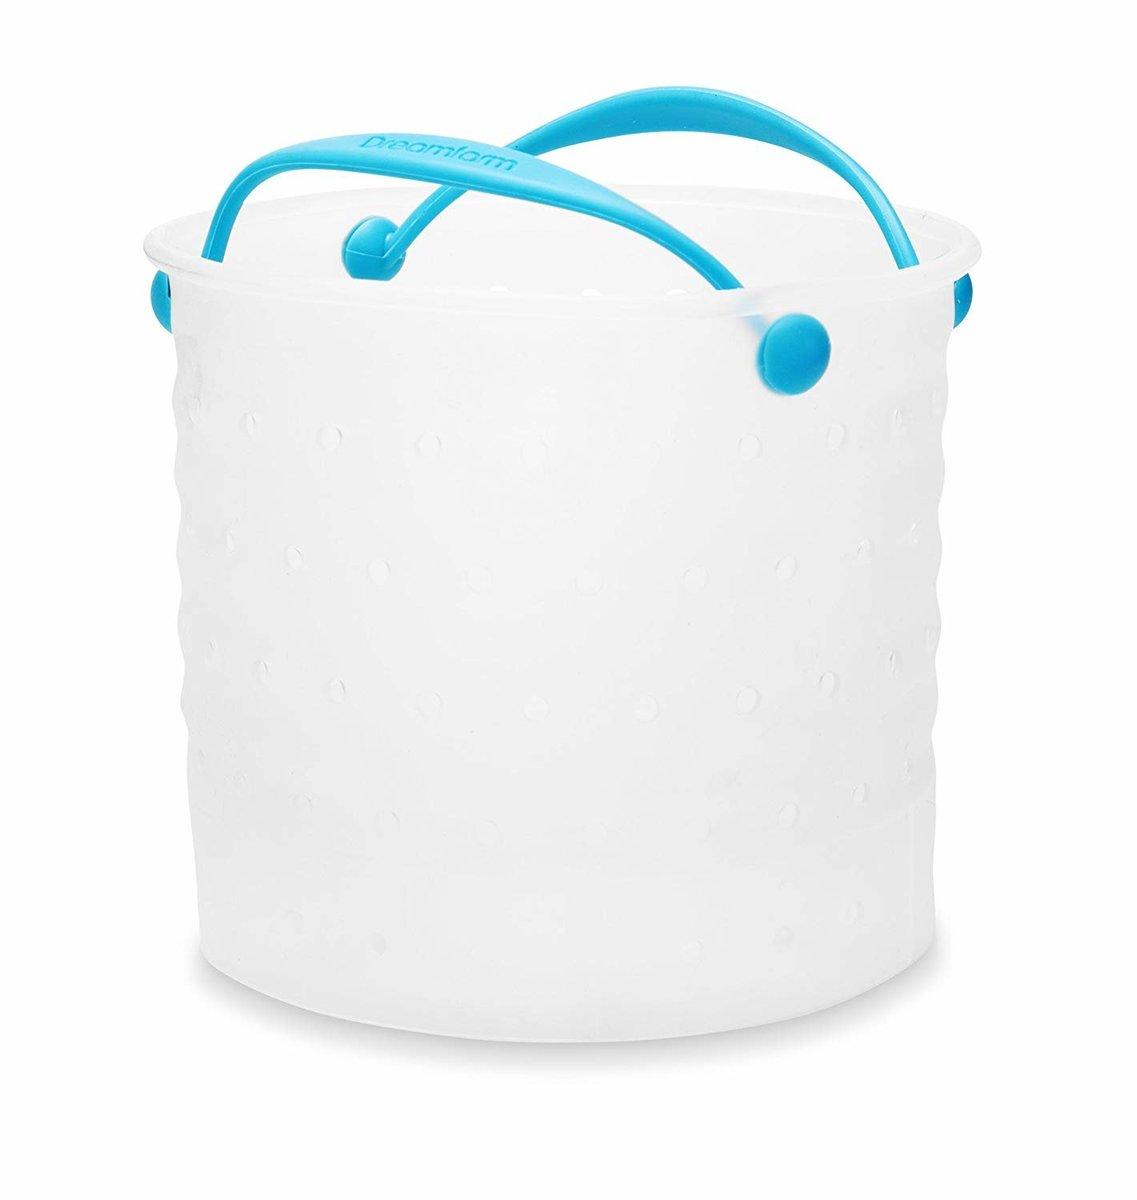 Vebo 矽膠蔬菜水煮鍋內濾籃小(適用於蒸煮、水煮、清洗和隔水)